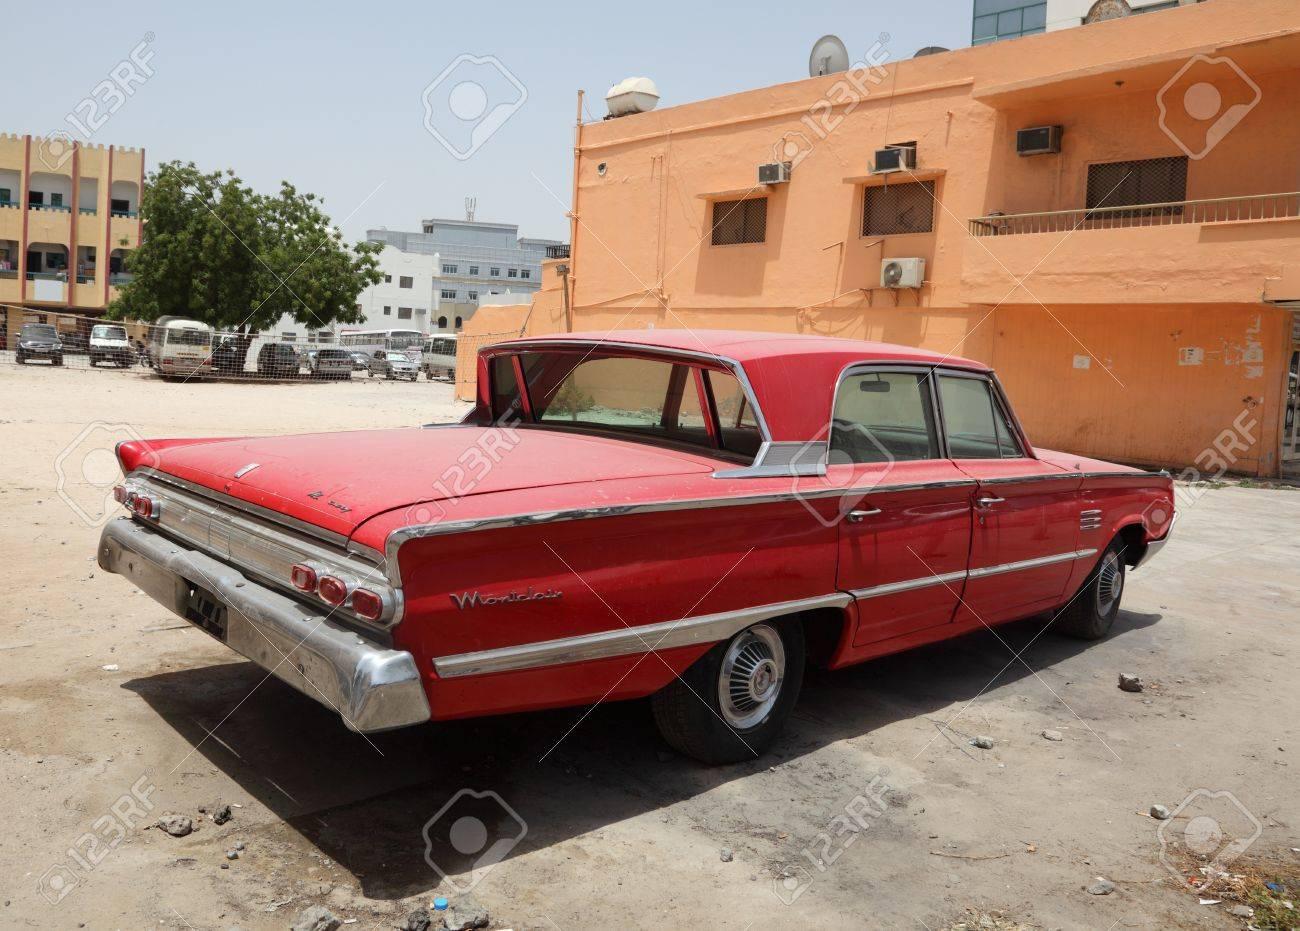 Vintage American Car Mercury Montclair From 1964 Stock Photo ...